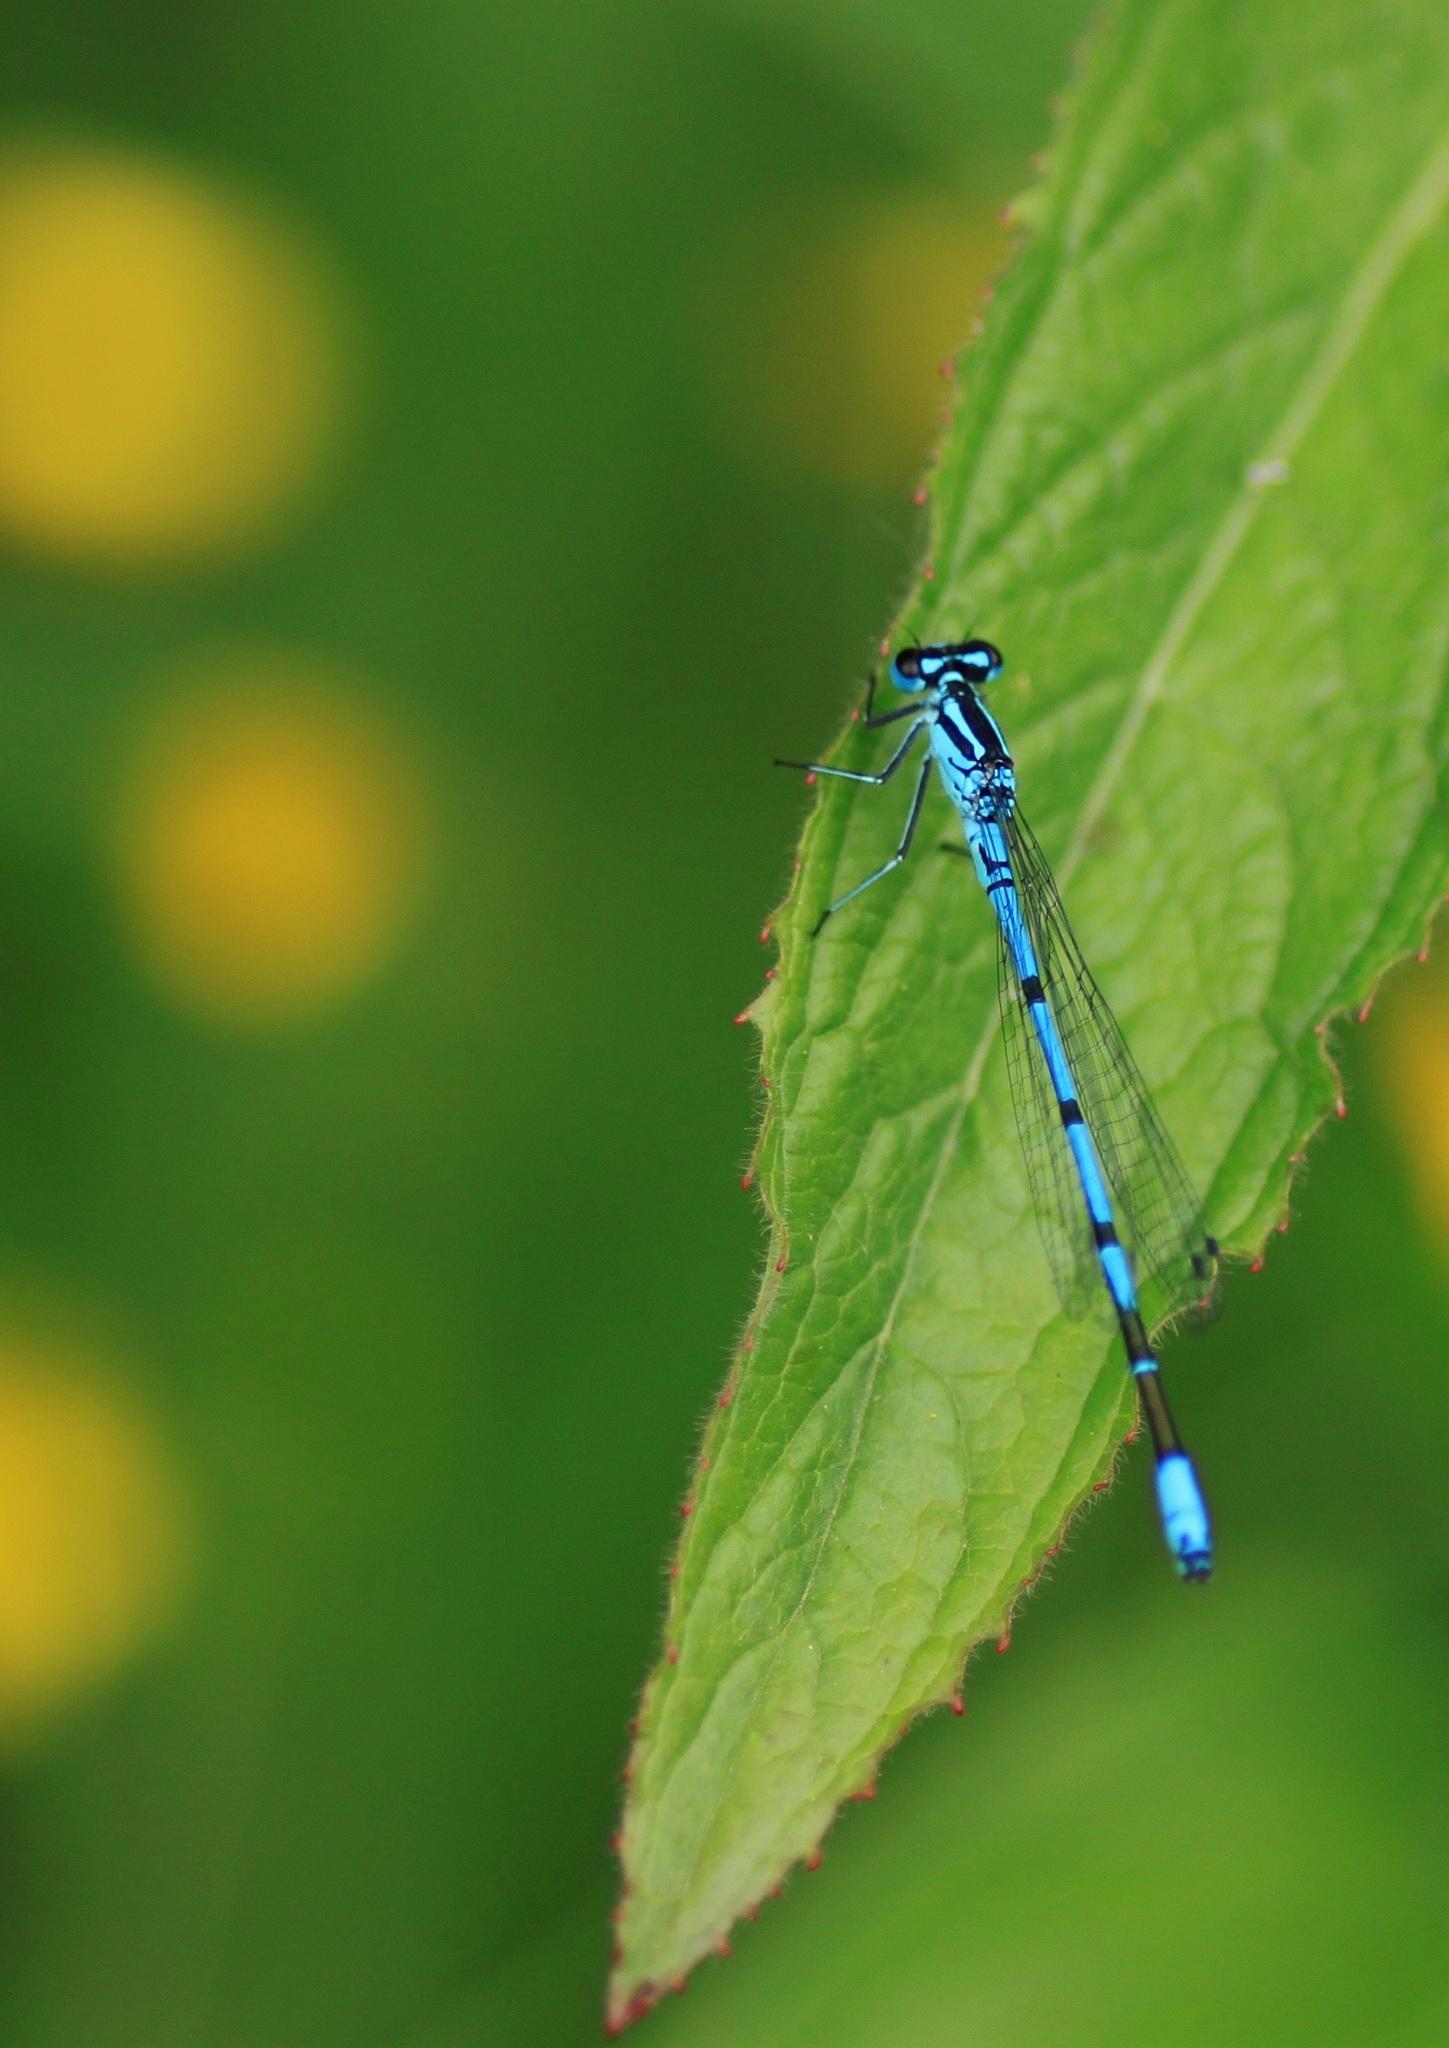 dradonfly on leave by Tineke Deuntje